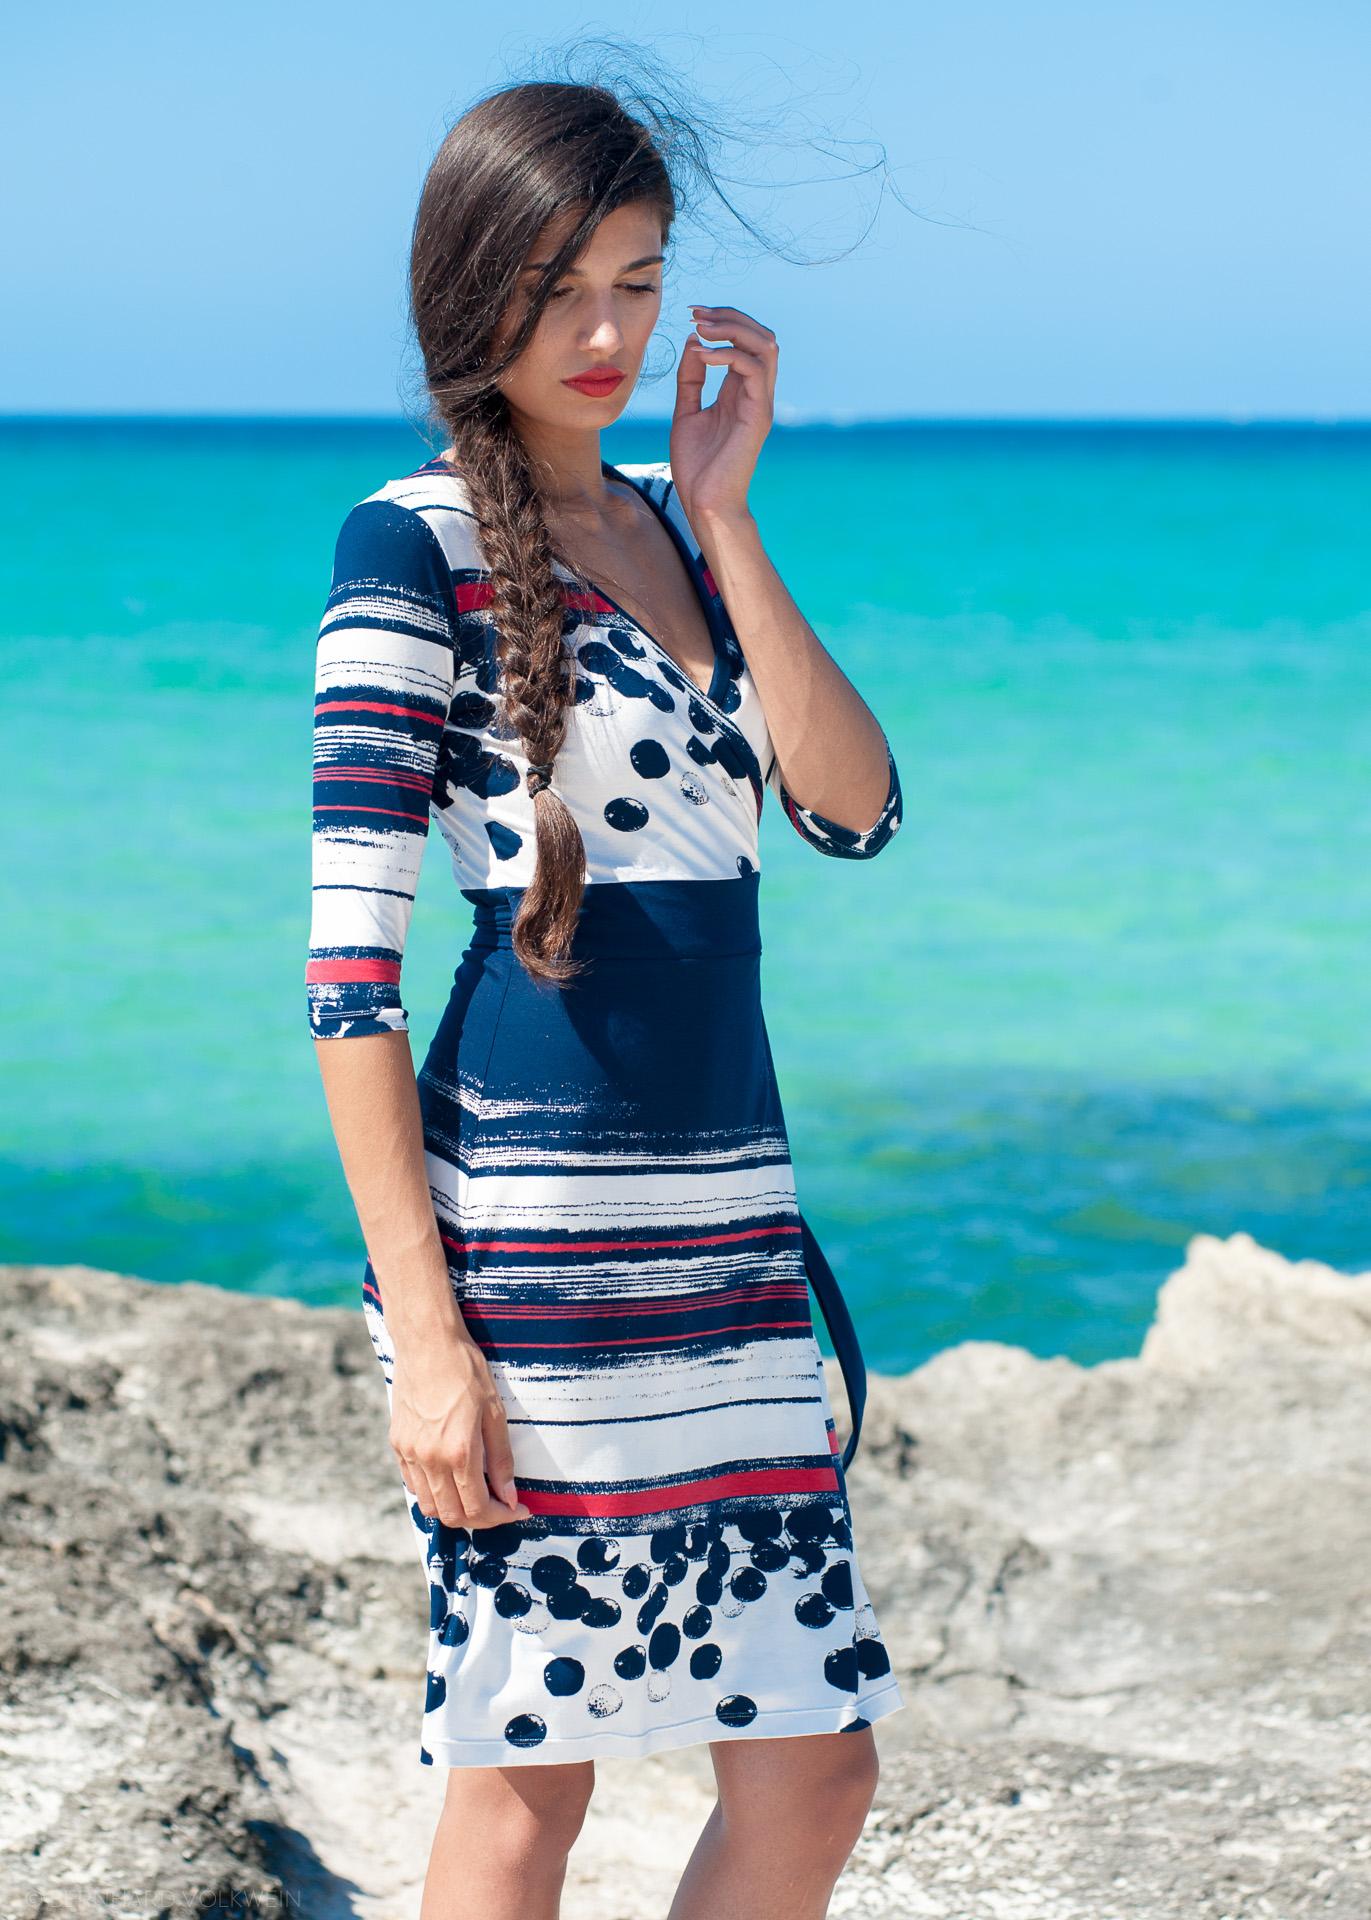 Mallorca - Fashionshooting mit Vicenca Petrovic - Spring Summer Collection by Jana Lenartz